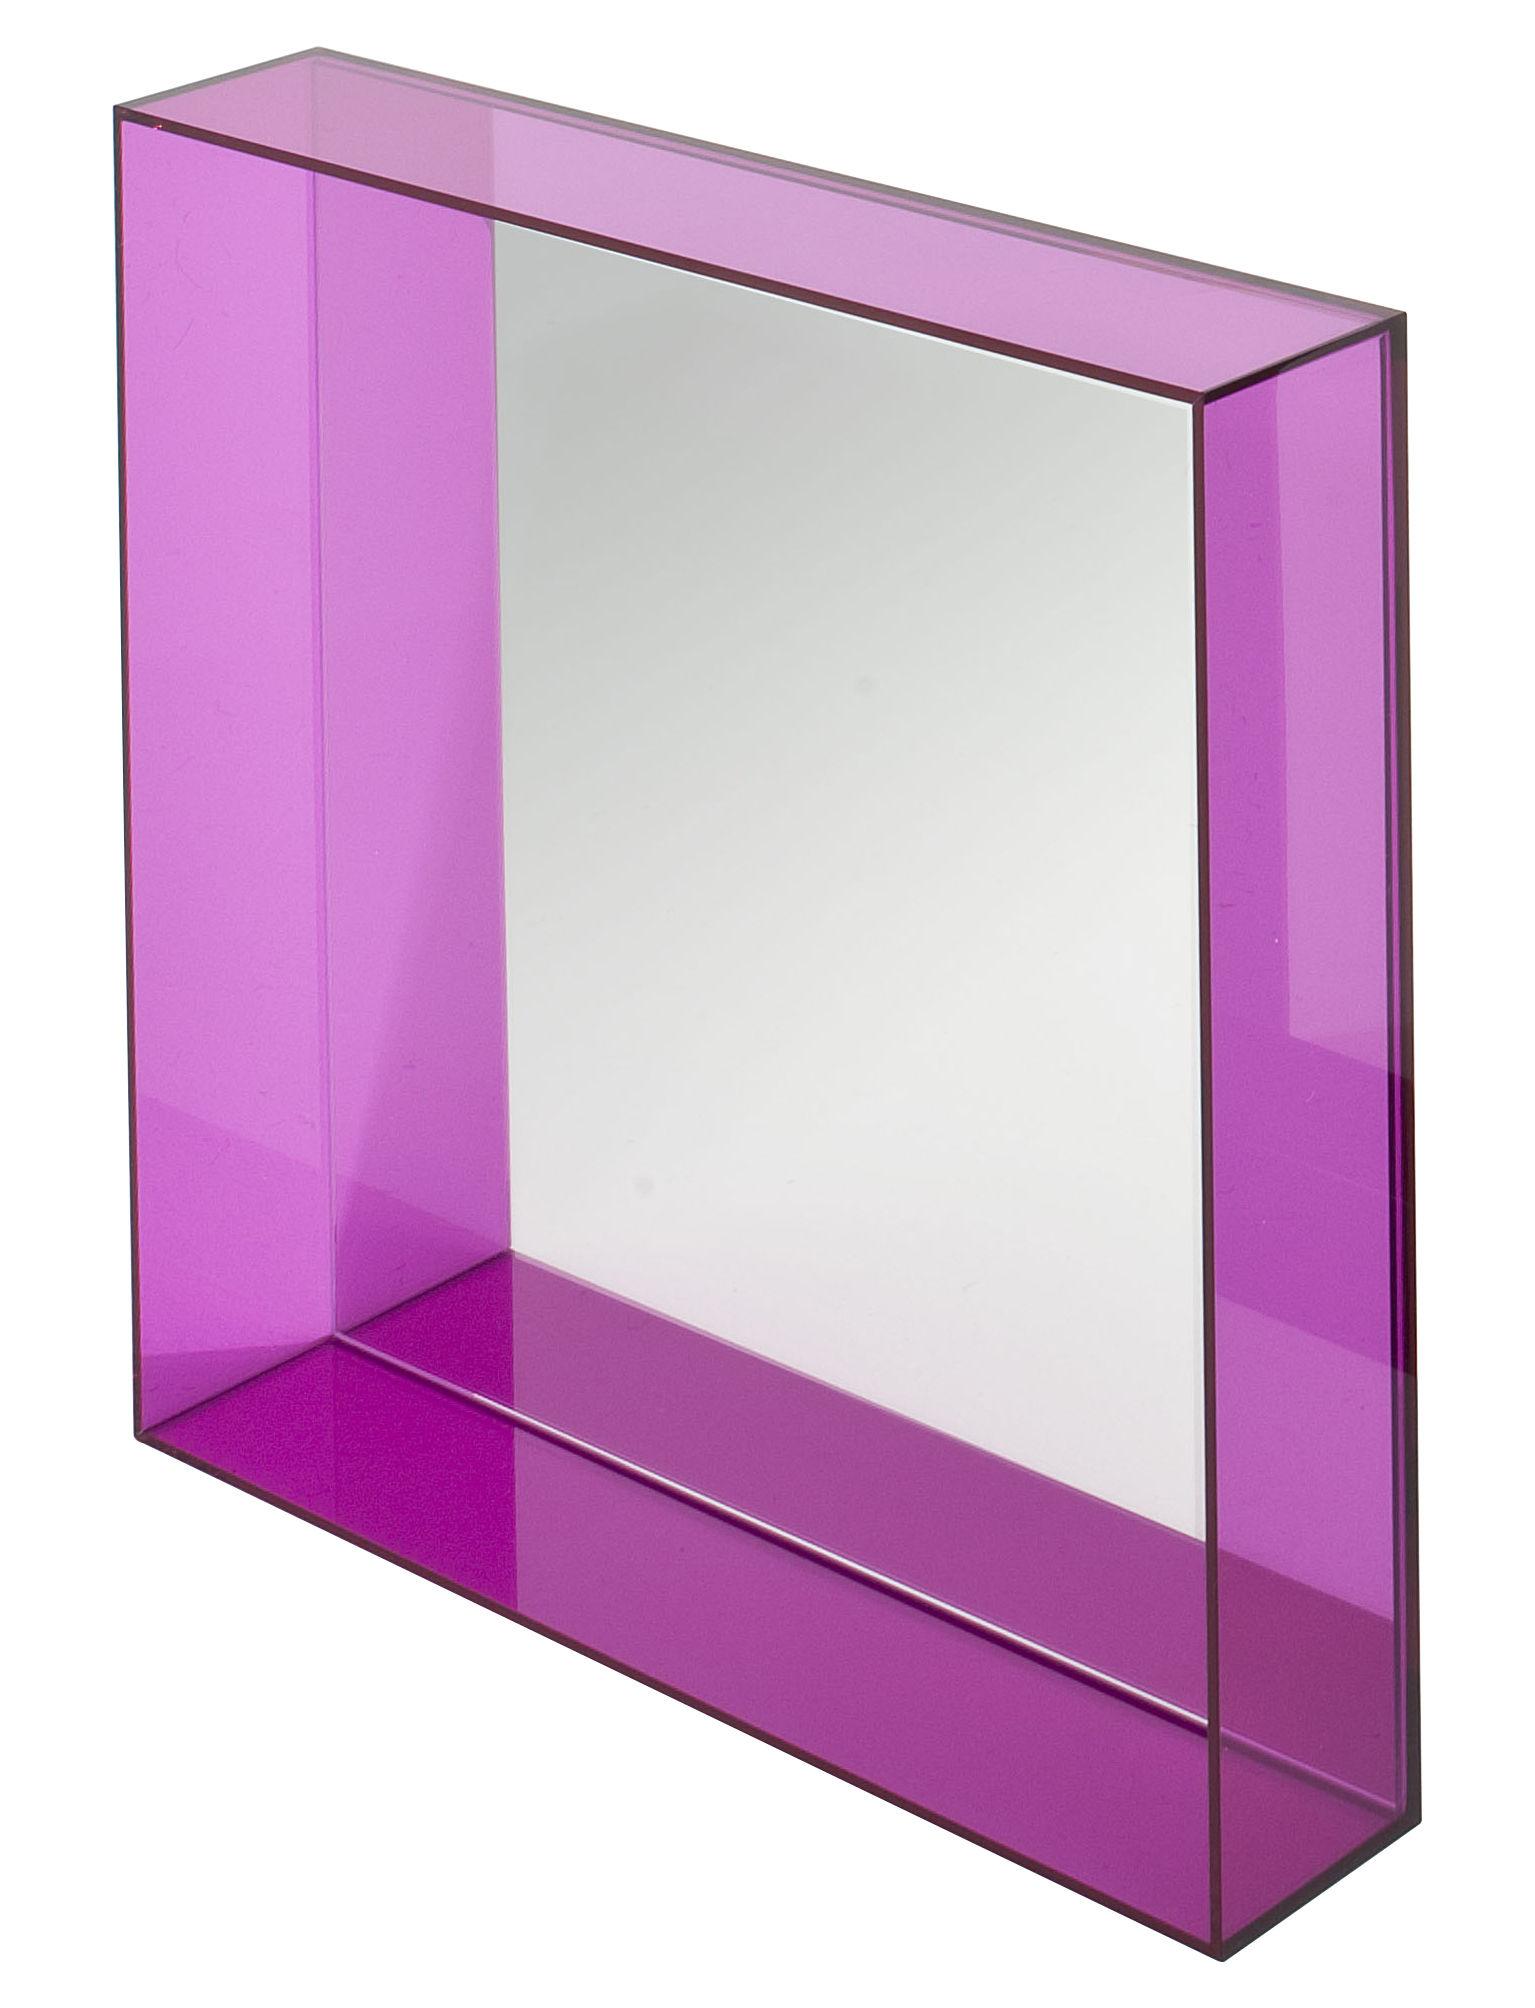 Accessoires - Accessoires für das Bad - Only me Wandspiegel / L 50 cm x H 50 cm - Kartell - Fuchsia - PMMA